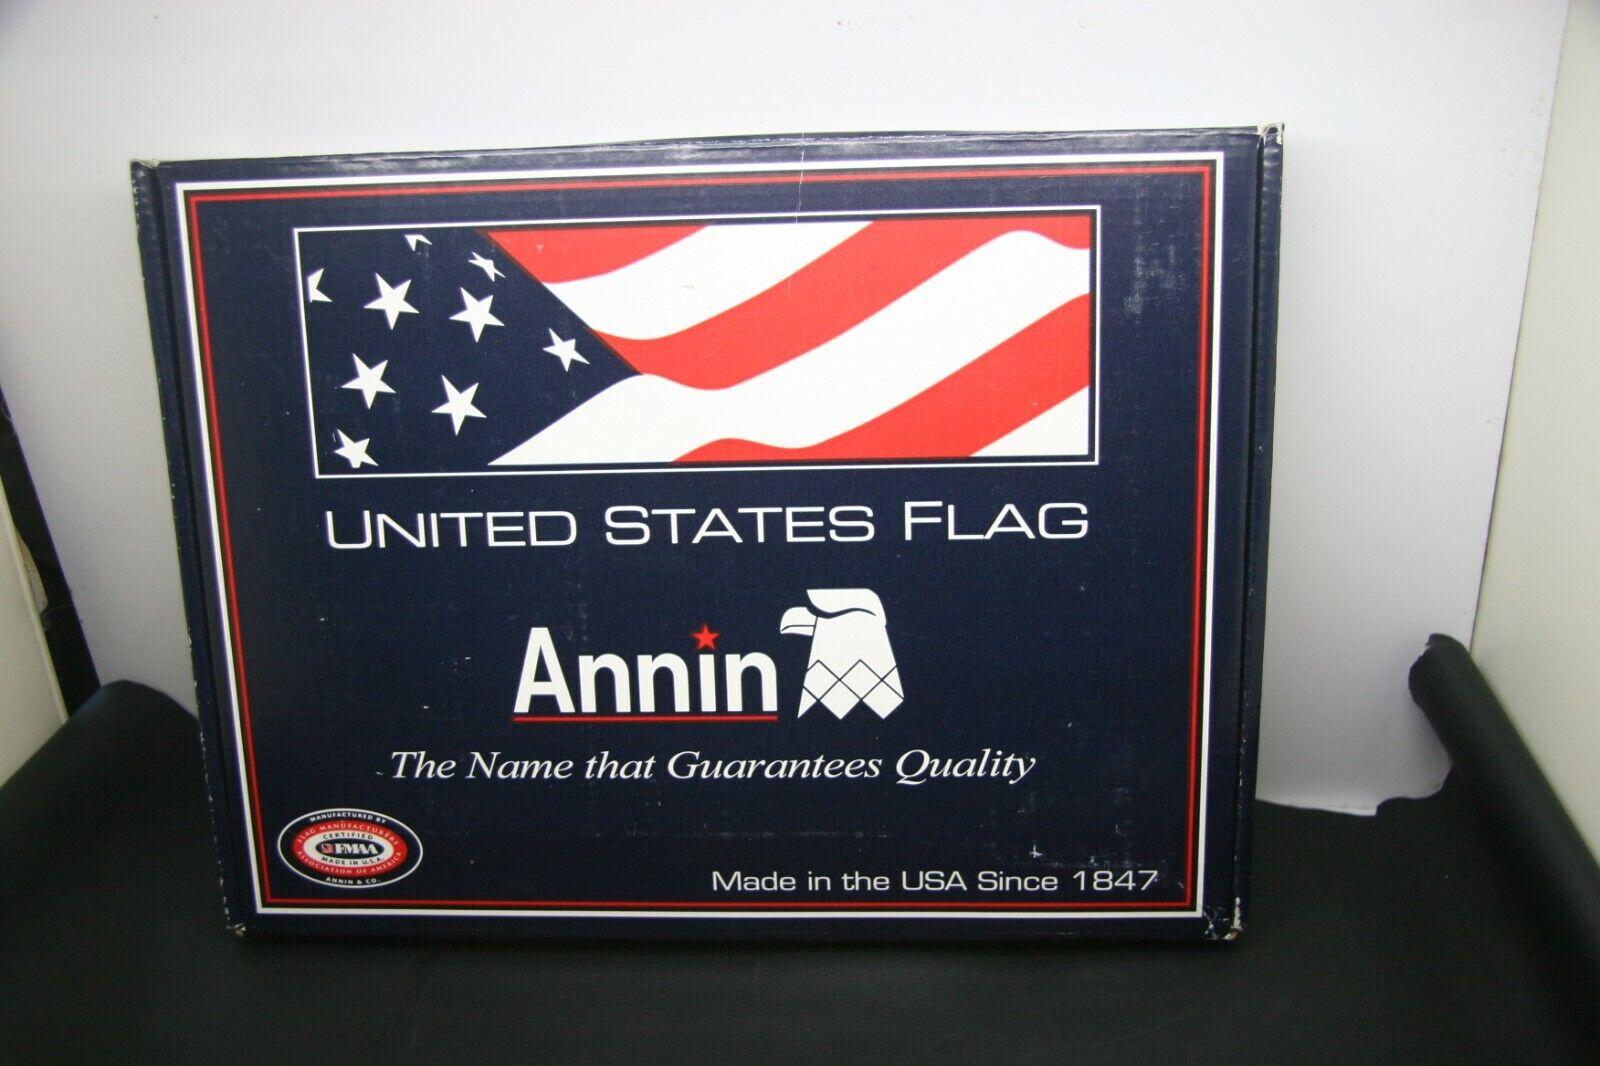 Annin UNITED STATE FLAG 3x5' ALL Weather NYL-GLO NYLON USA